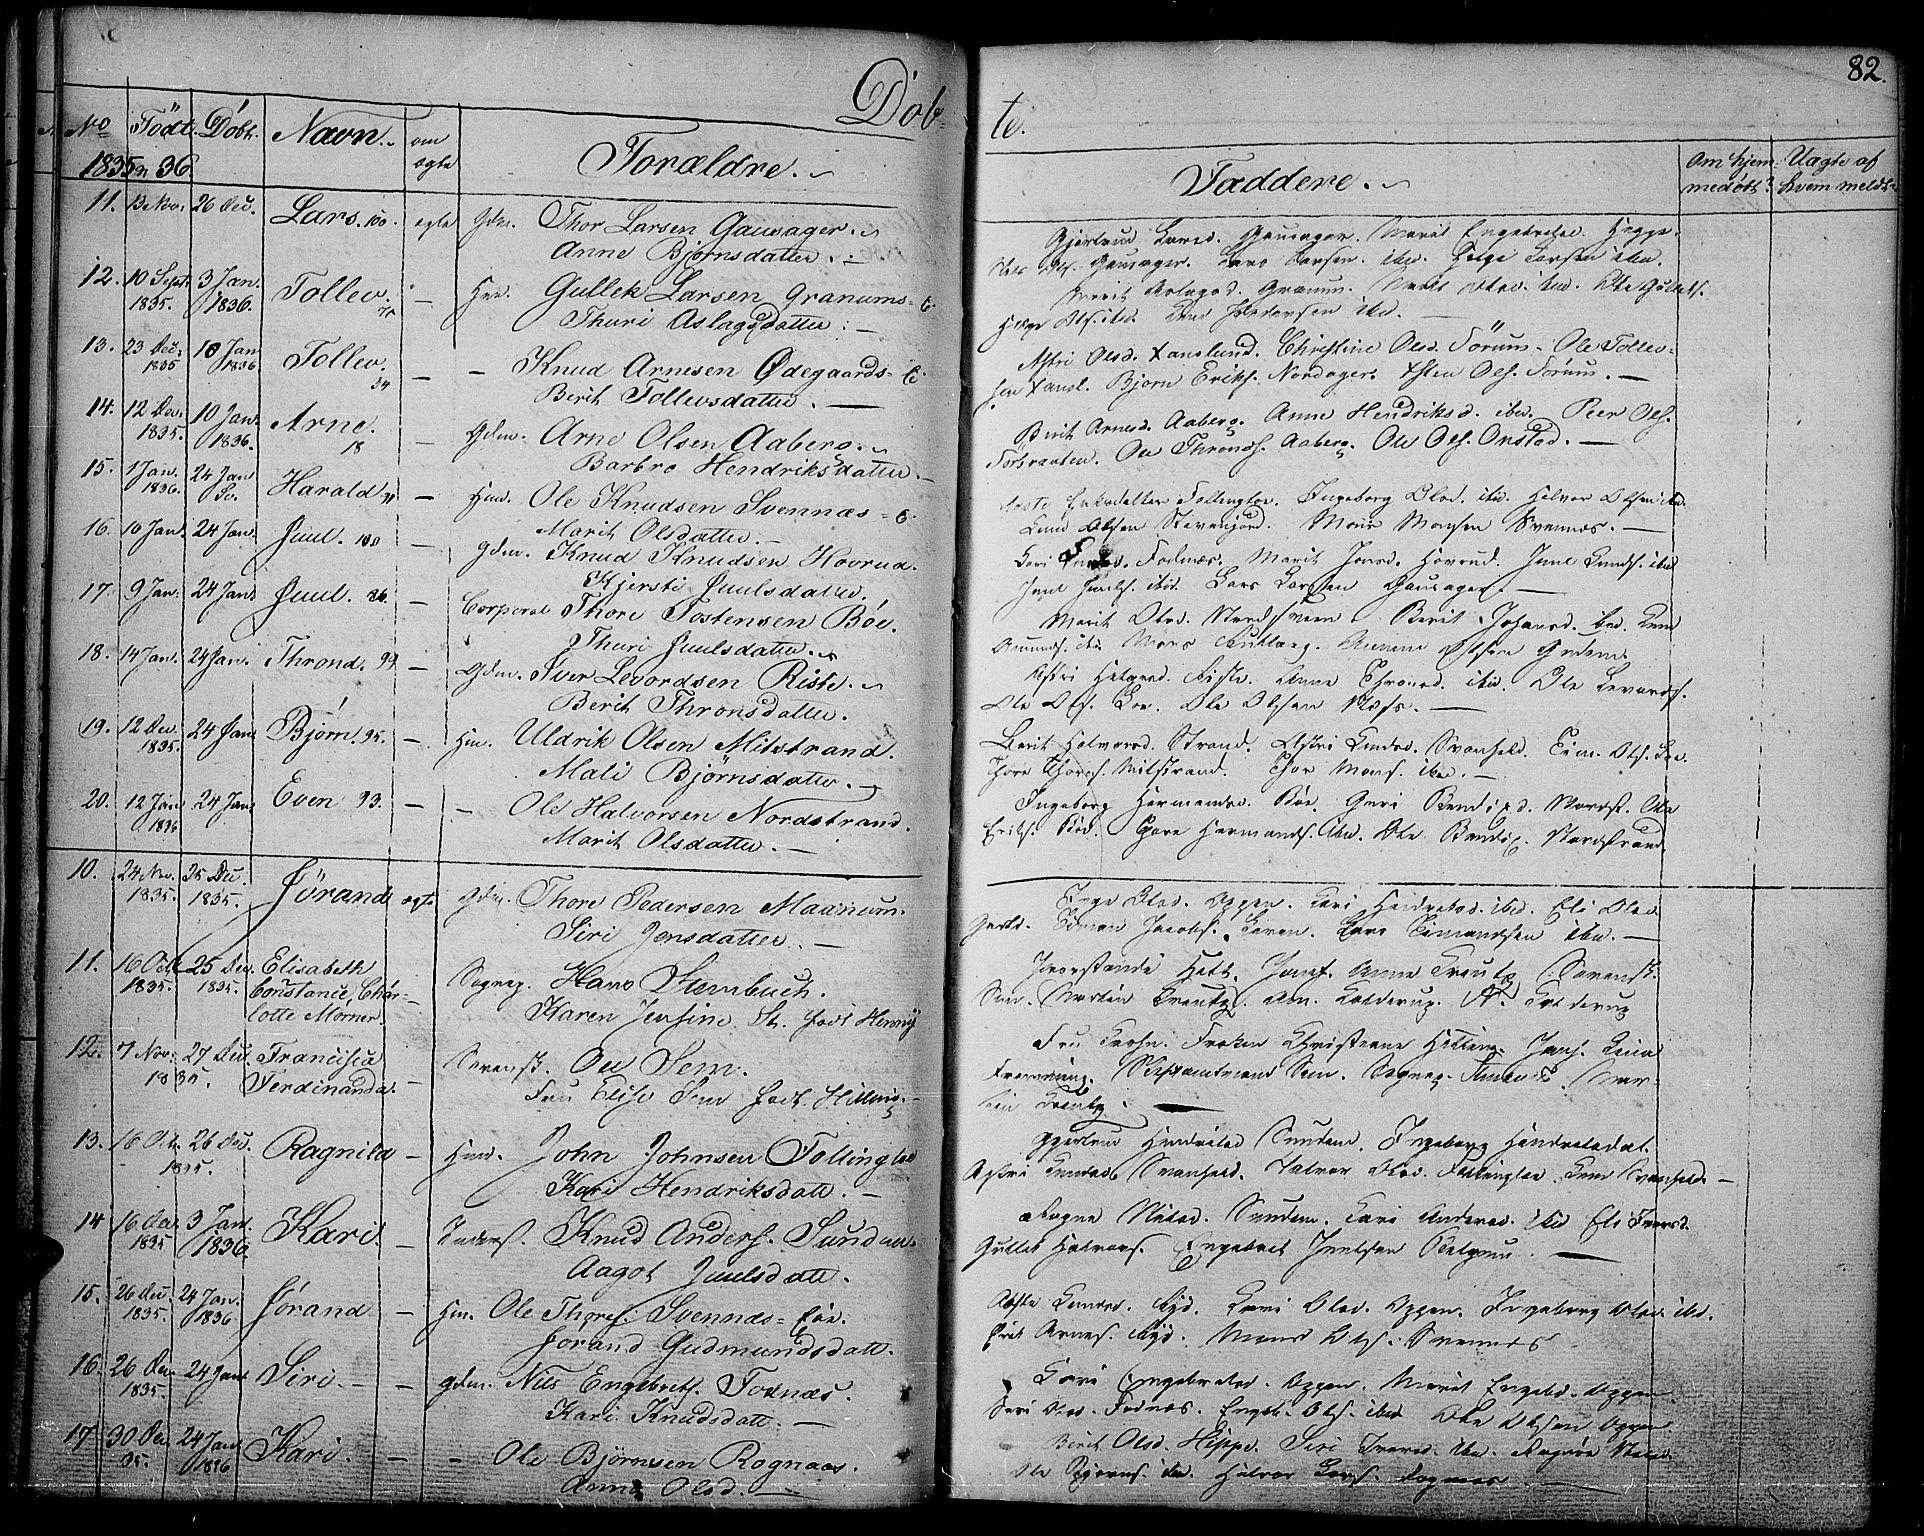 SAH, Nord-Aurdal prestekontor, Ministerialbok nr. 3, 1828-1841, s. 82